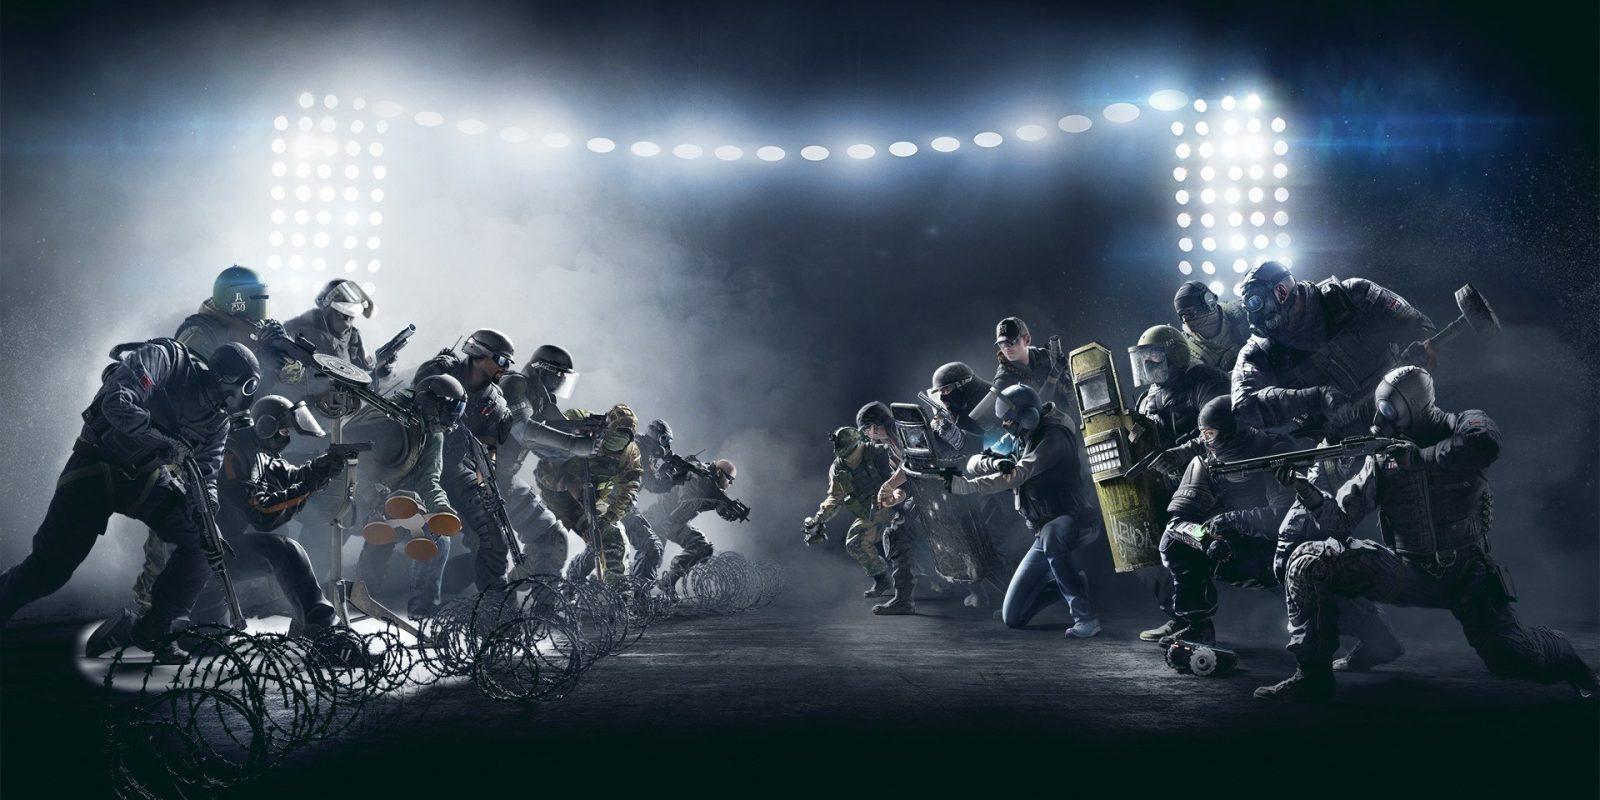 Grab some free Rainbow Six Siege DLC via Twitch Prime - 9to5Toys